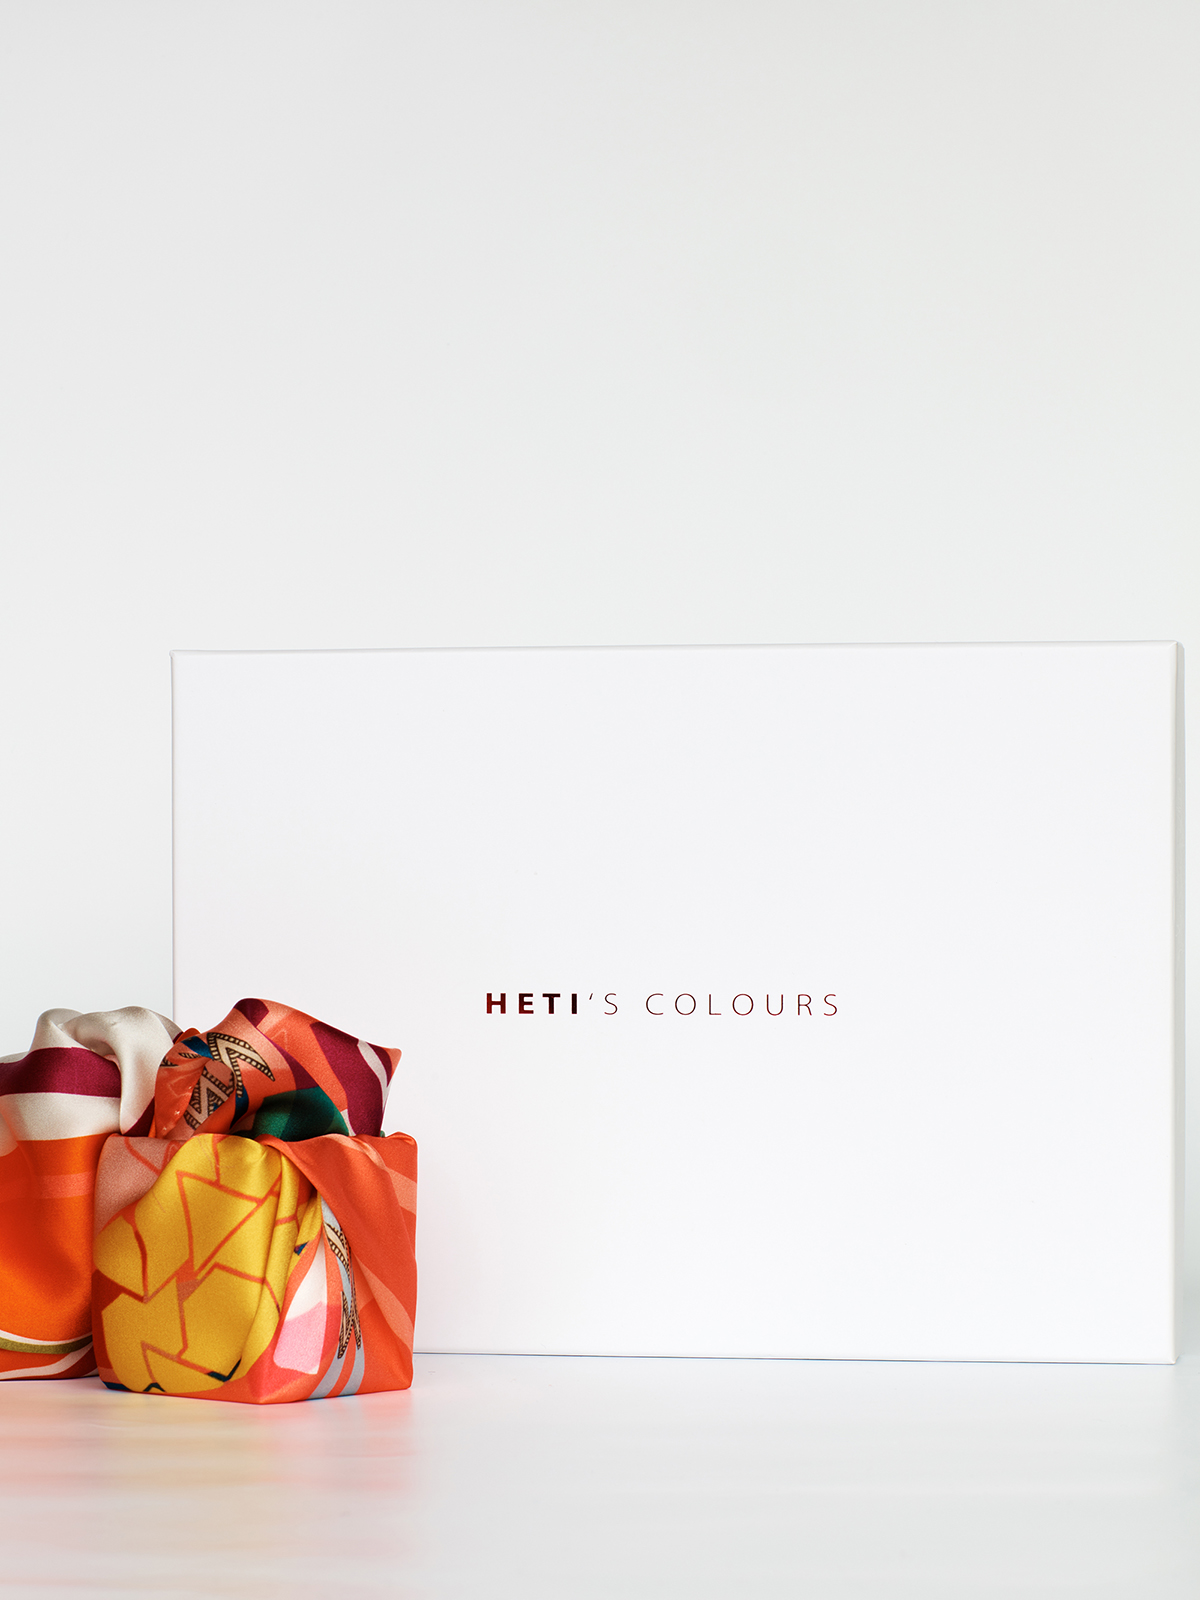 SS19 Silk Scarves Heti's Colours